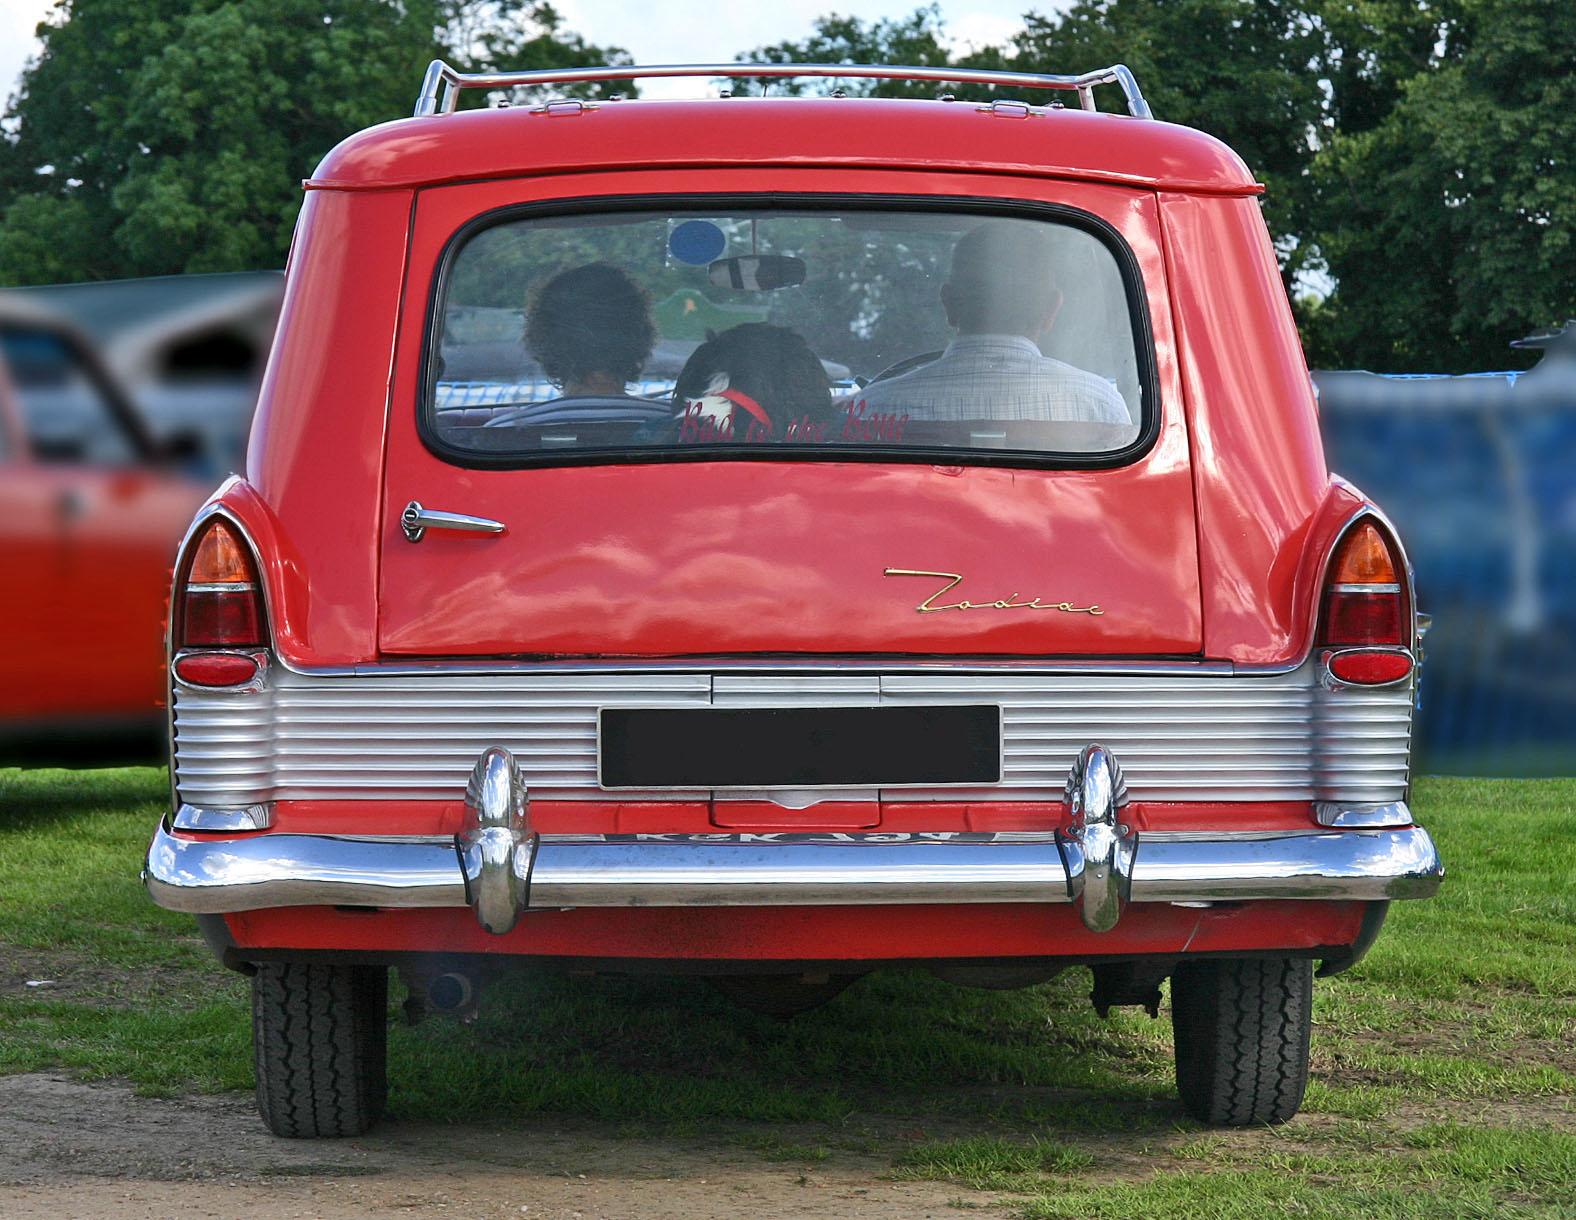 Ford Zephyr 1960 foto - 5